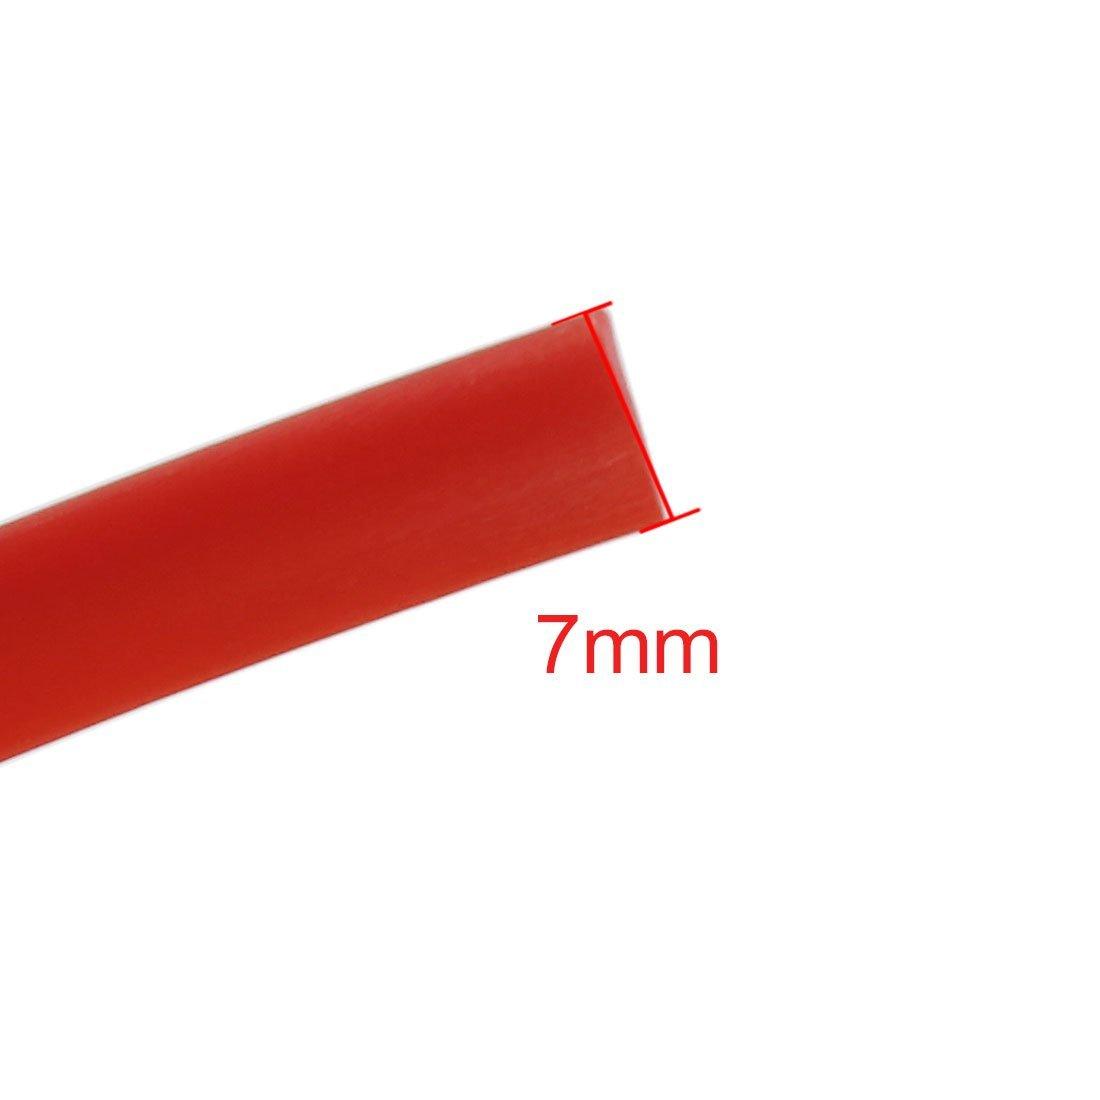 Amazon.com: eDealMax 5M franja roja Flexible Para Interior del coche exterrior Moldeo de Gaza: Automotive